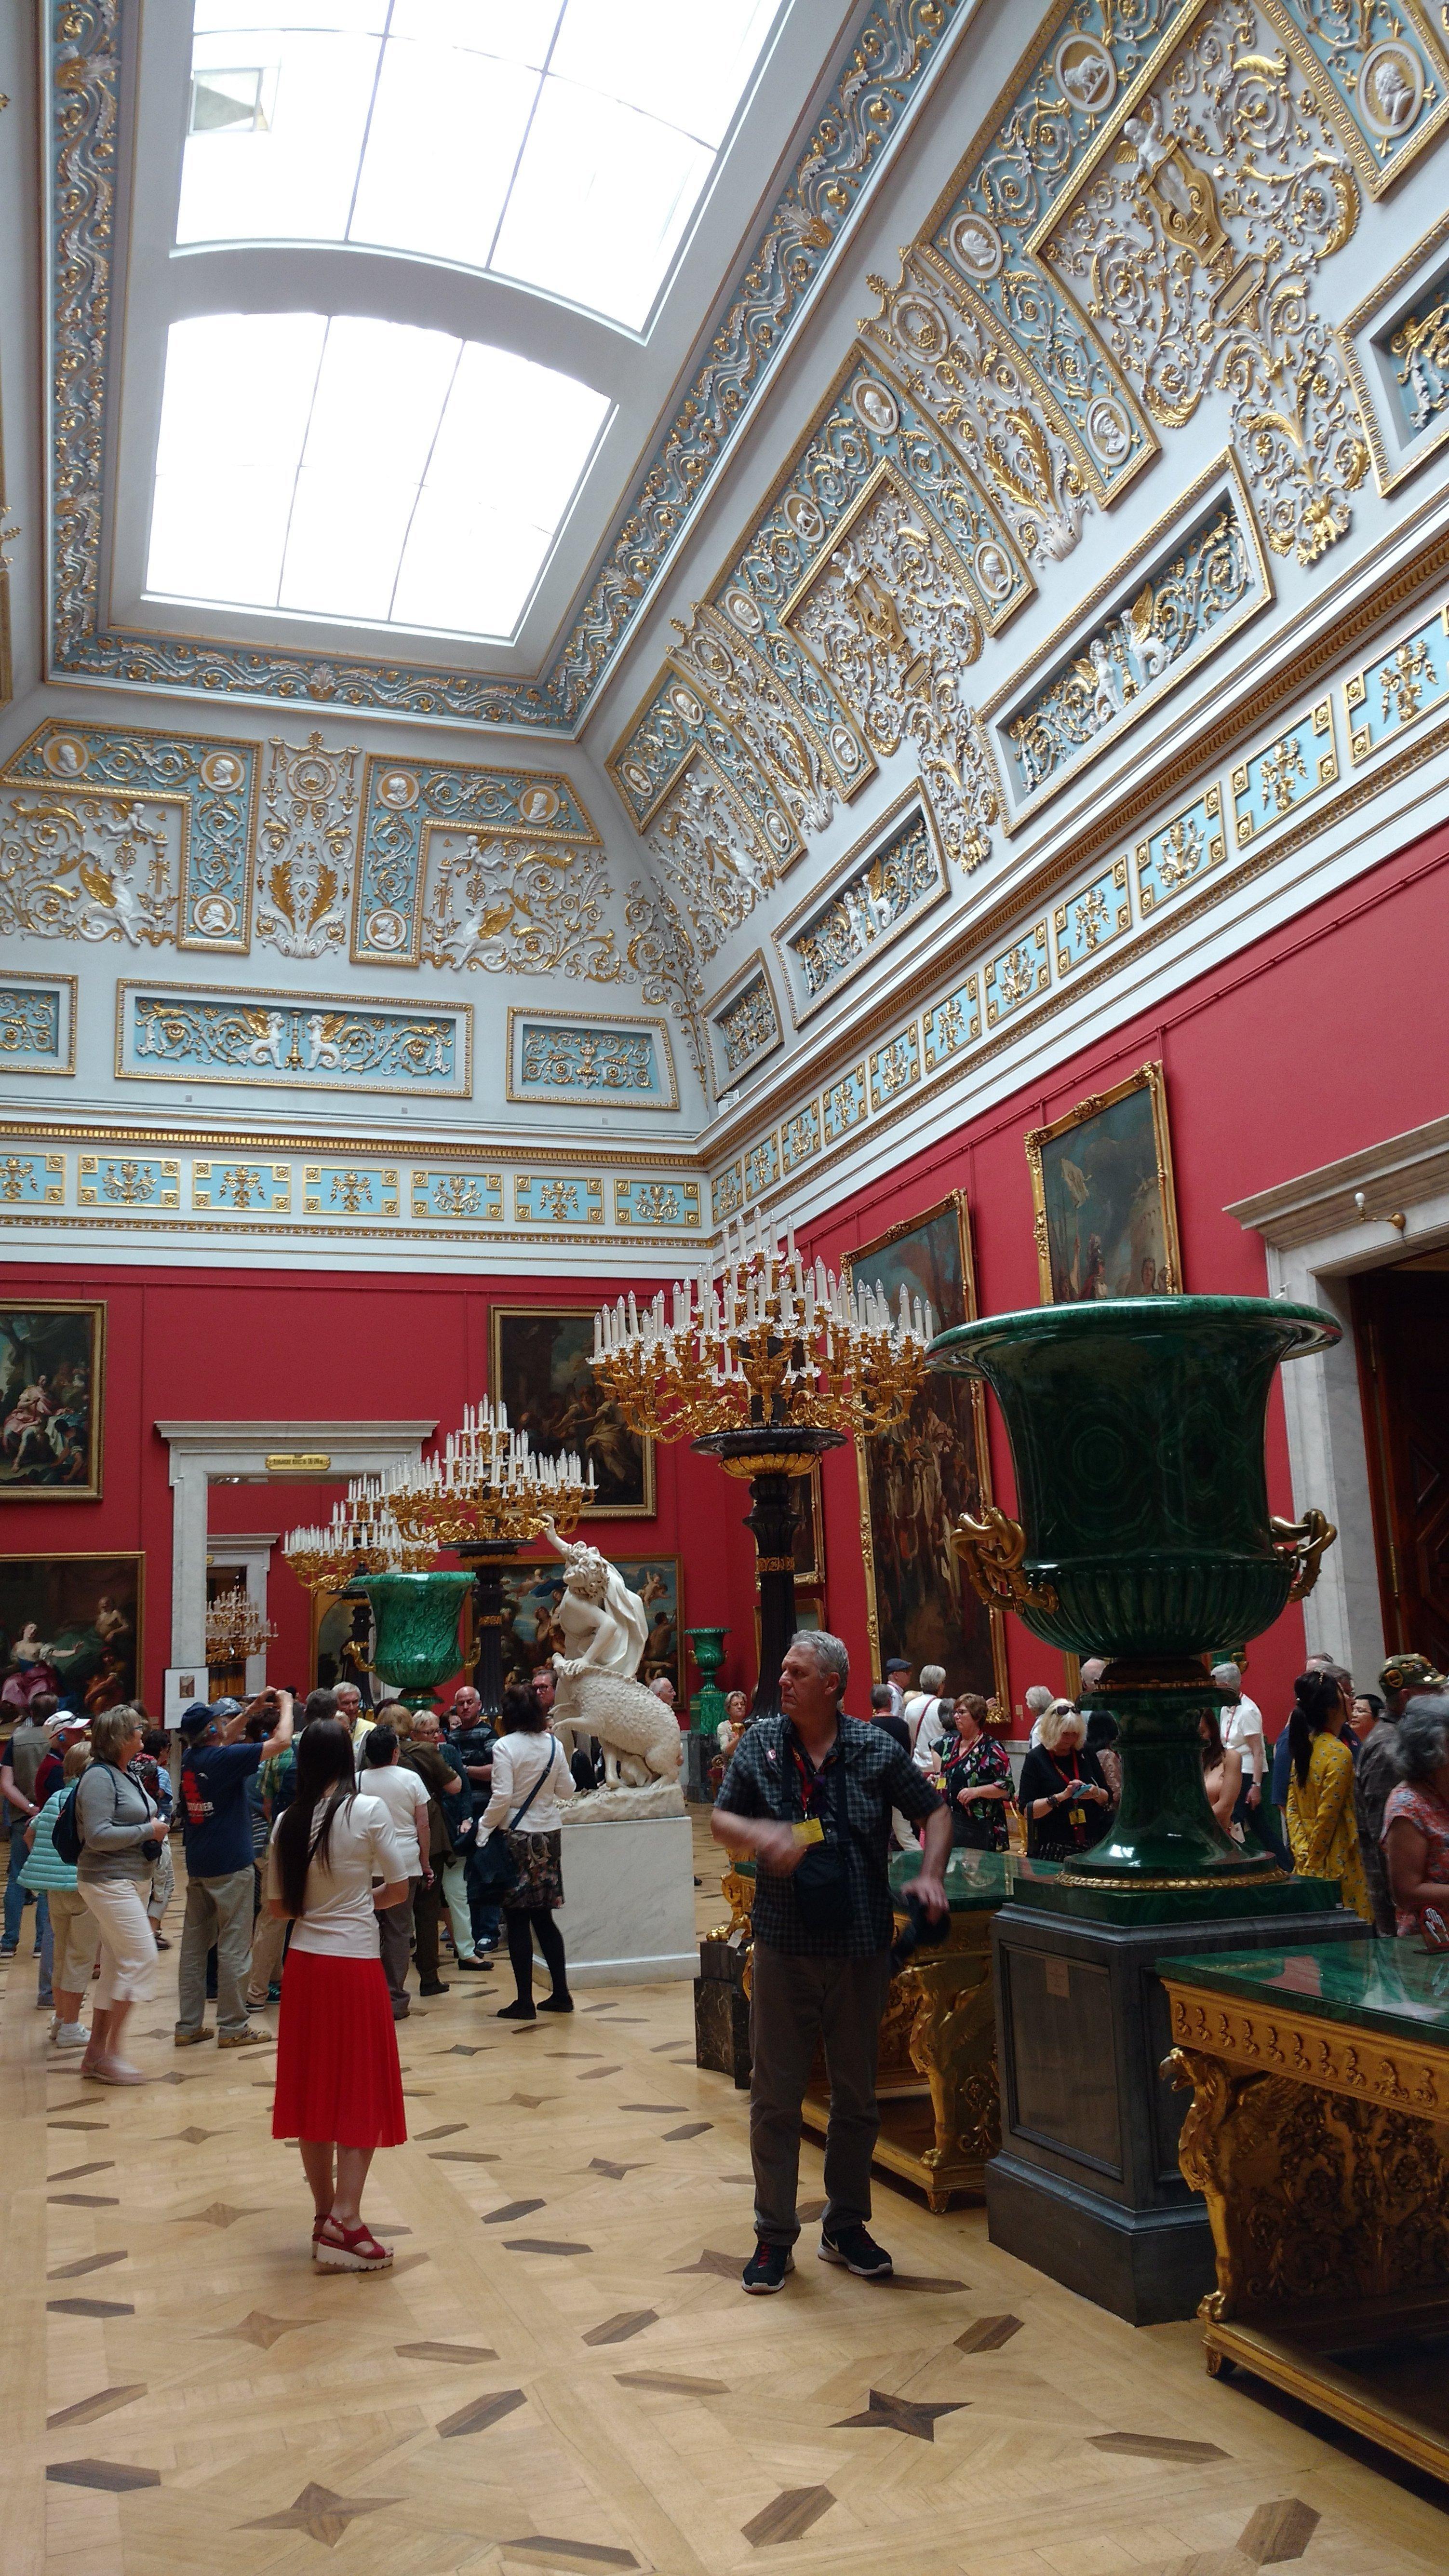 Ermitaż. Sankt Petersburg. 13 maja 2018 r.